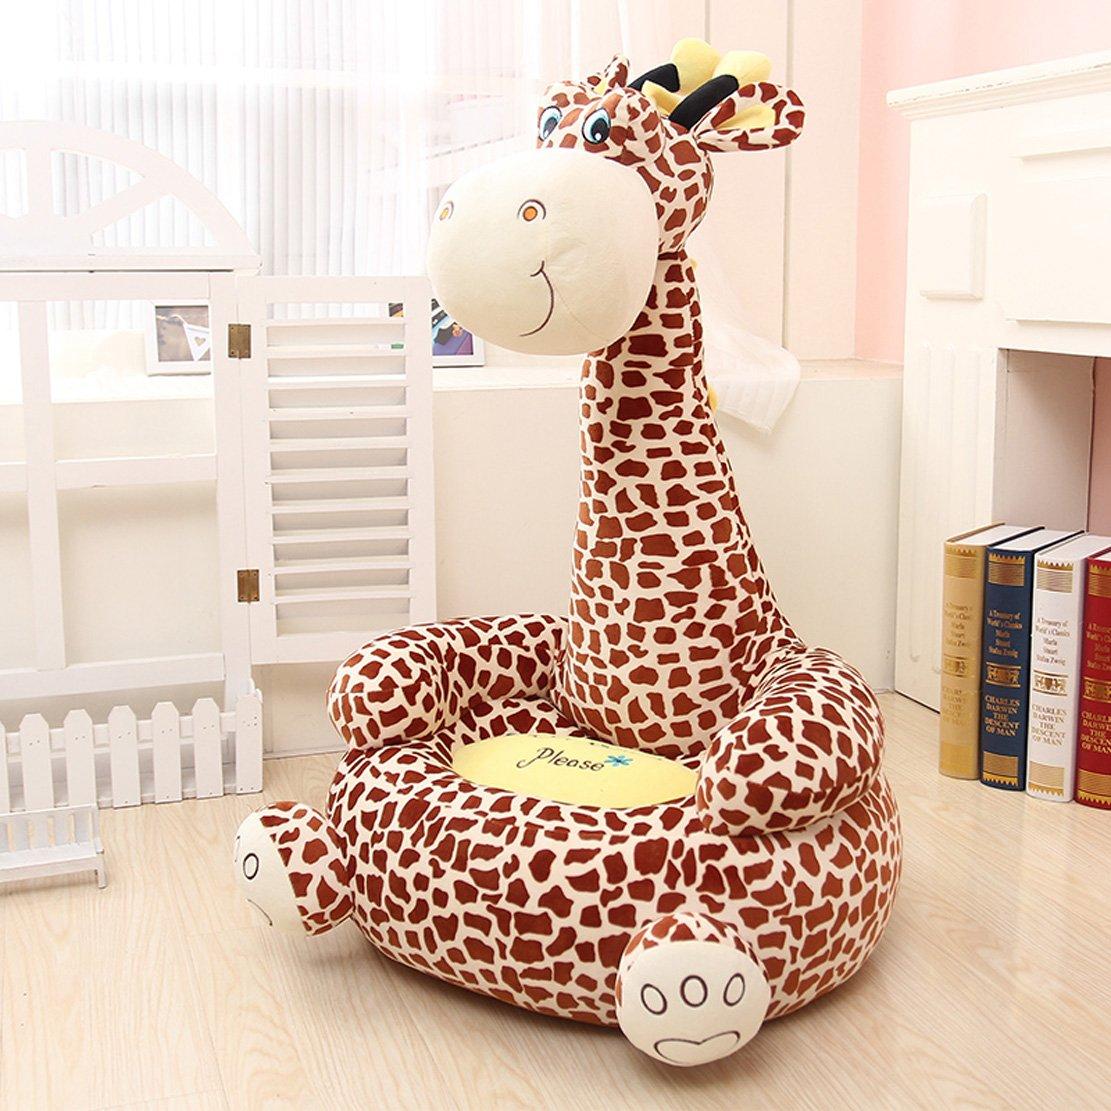 MAXYOYO Super Cute Plush Toy Bean Bag Chair Seat for Children,Cute Animal Plush Soft Sofa Seat,Cartoon Tatami Chairs,Birthday Gifts for Boys and Girls (brown giraffe)